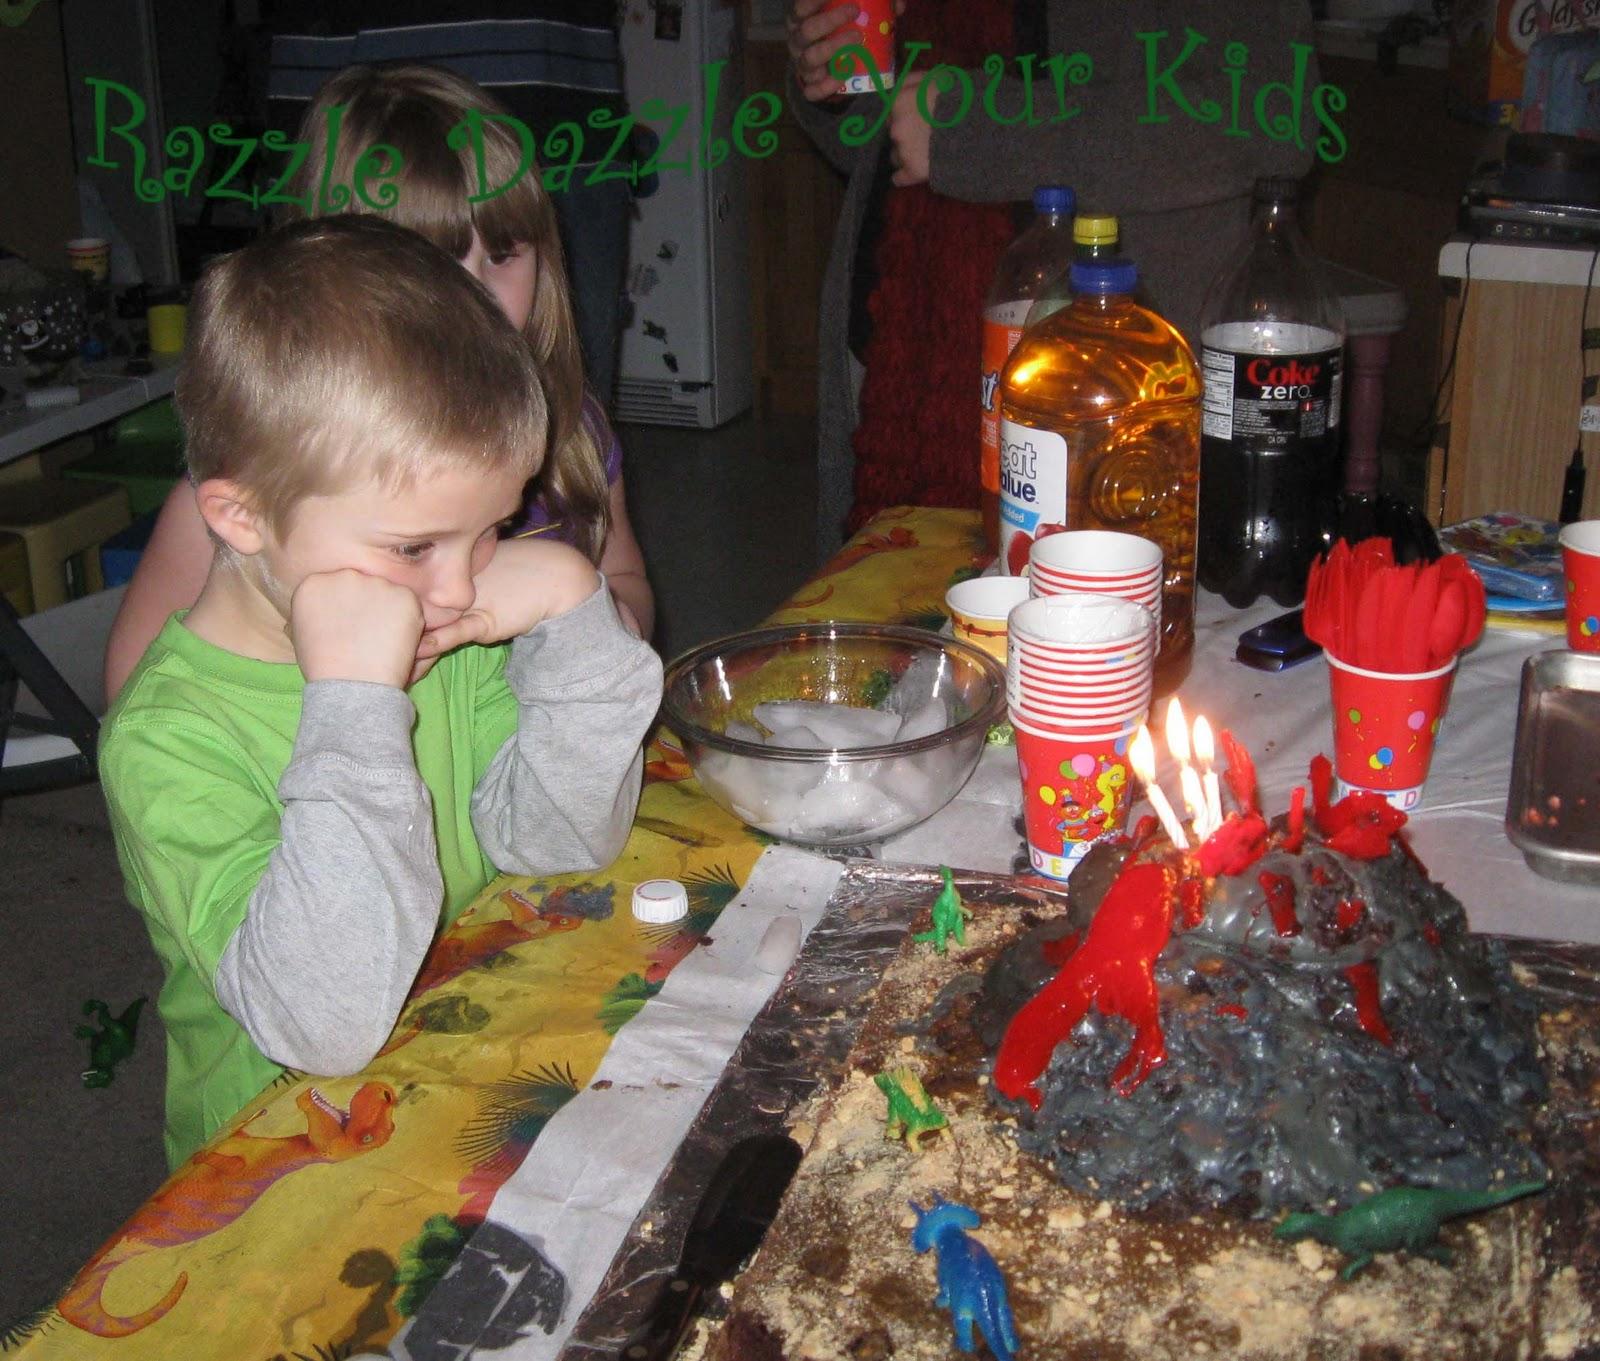 Razzle Dazzle Your Kids: Dinosaur Birthday Party (6 Years Old